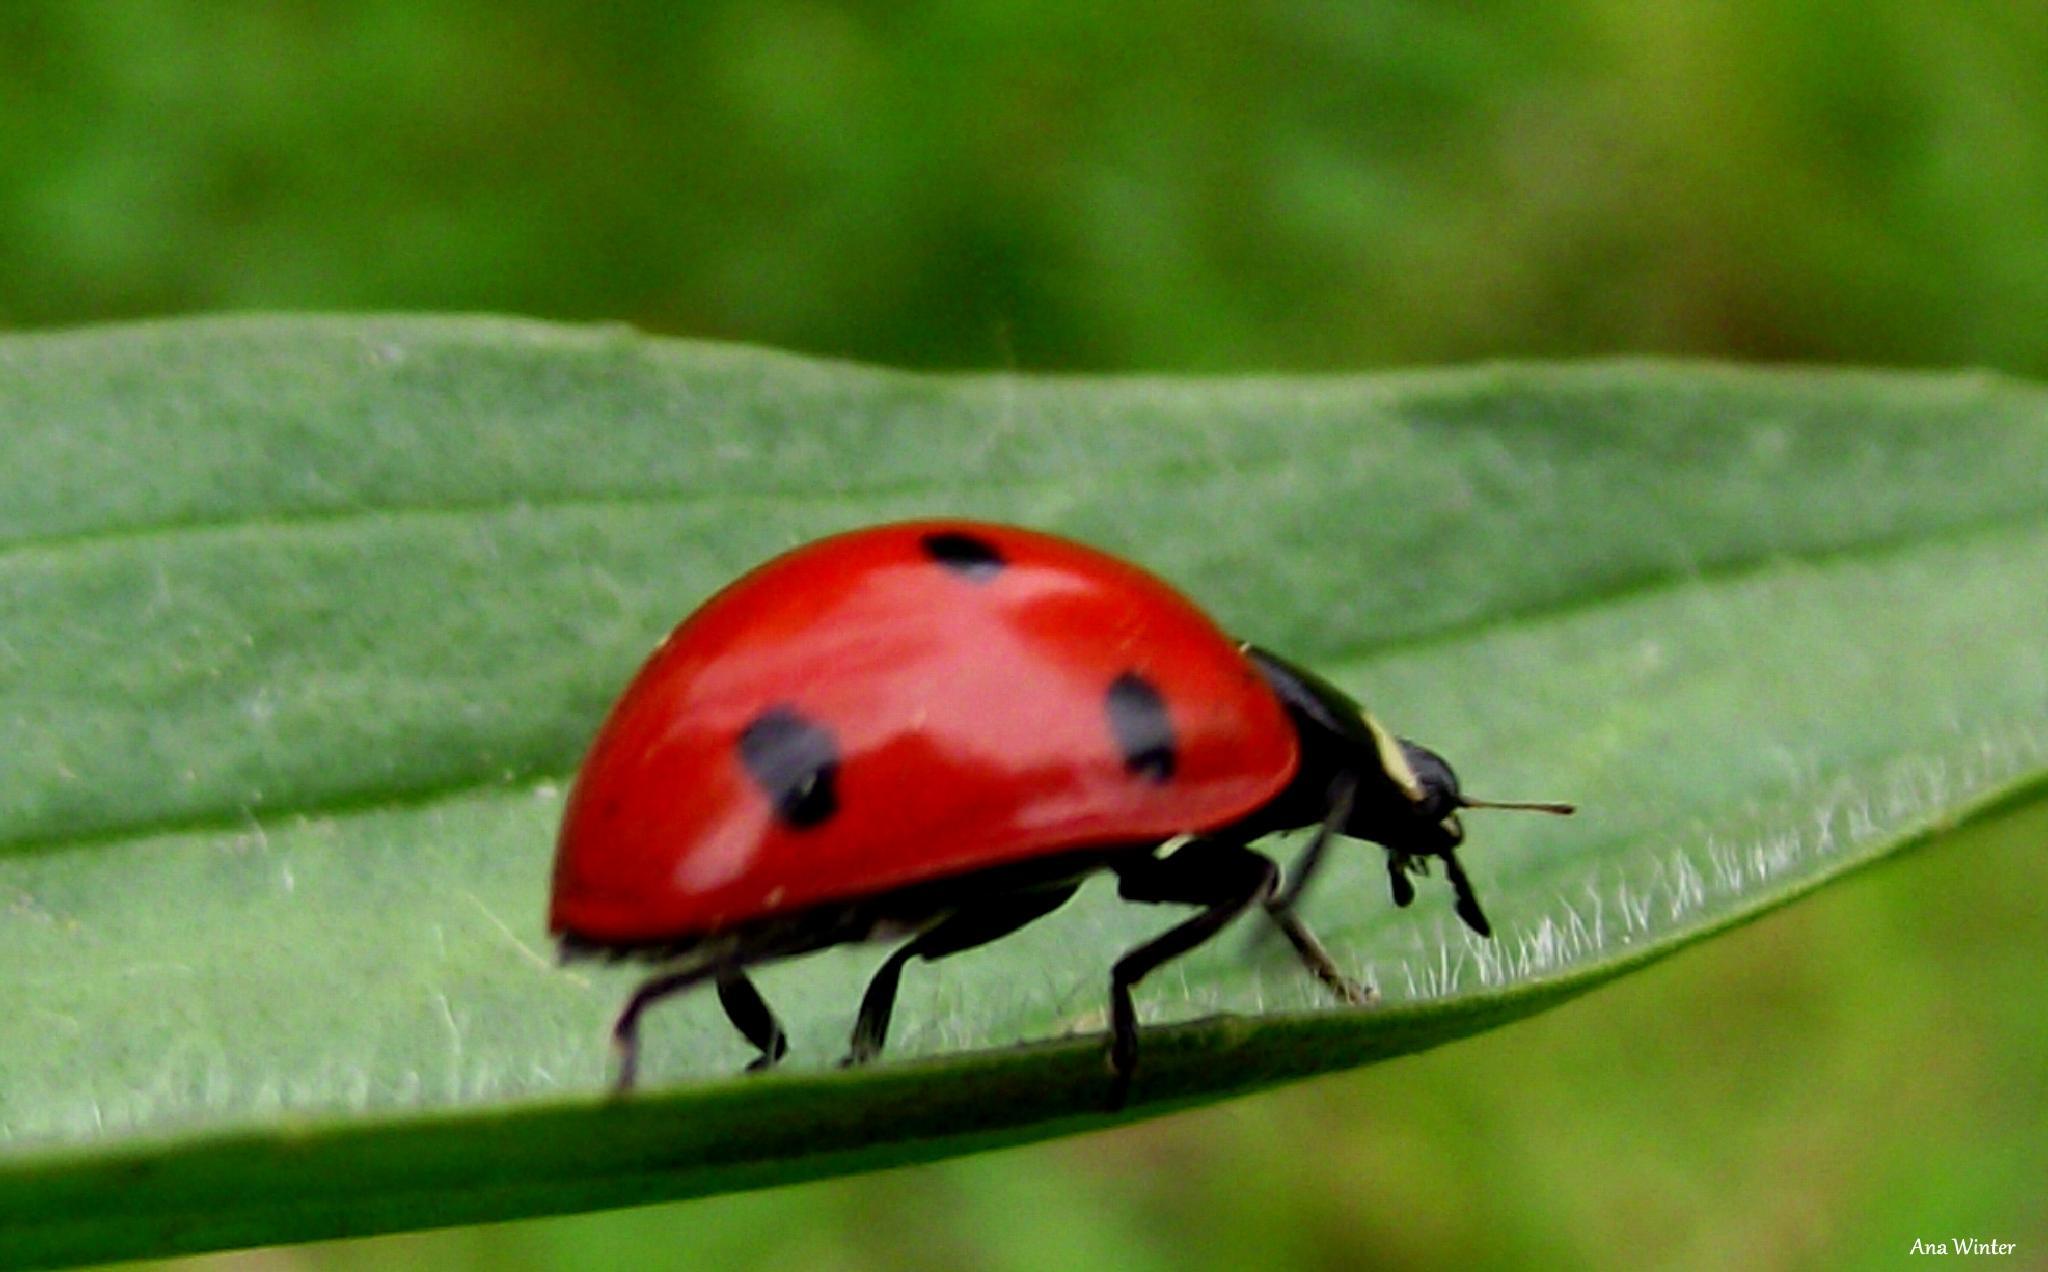 Fast Lady Bug by Ana Winter